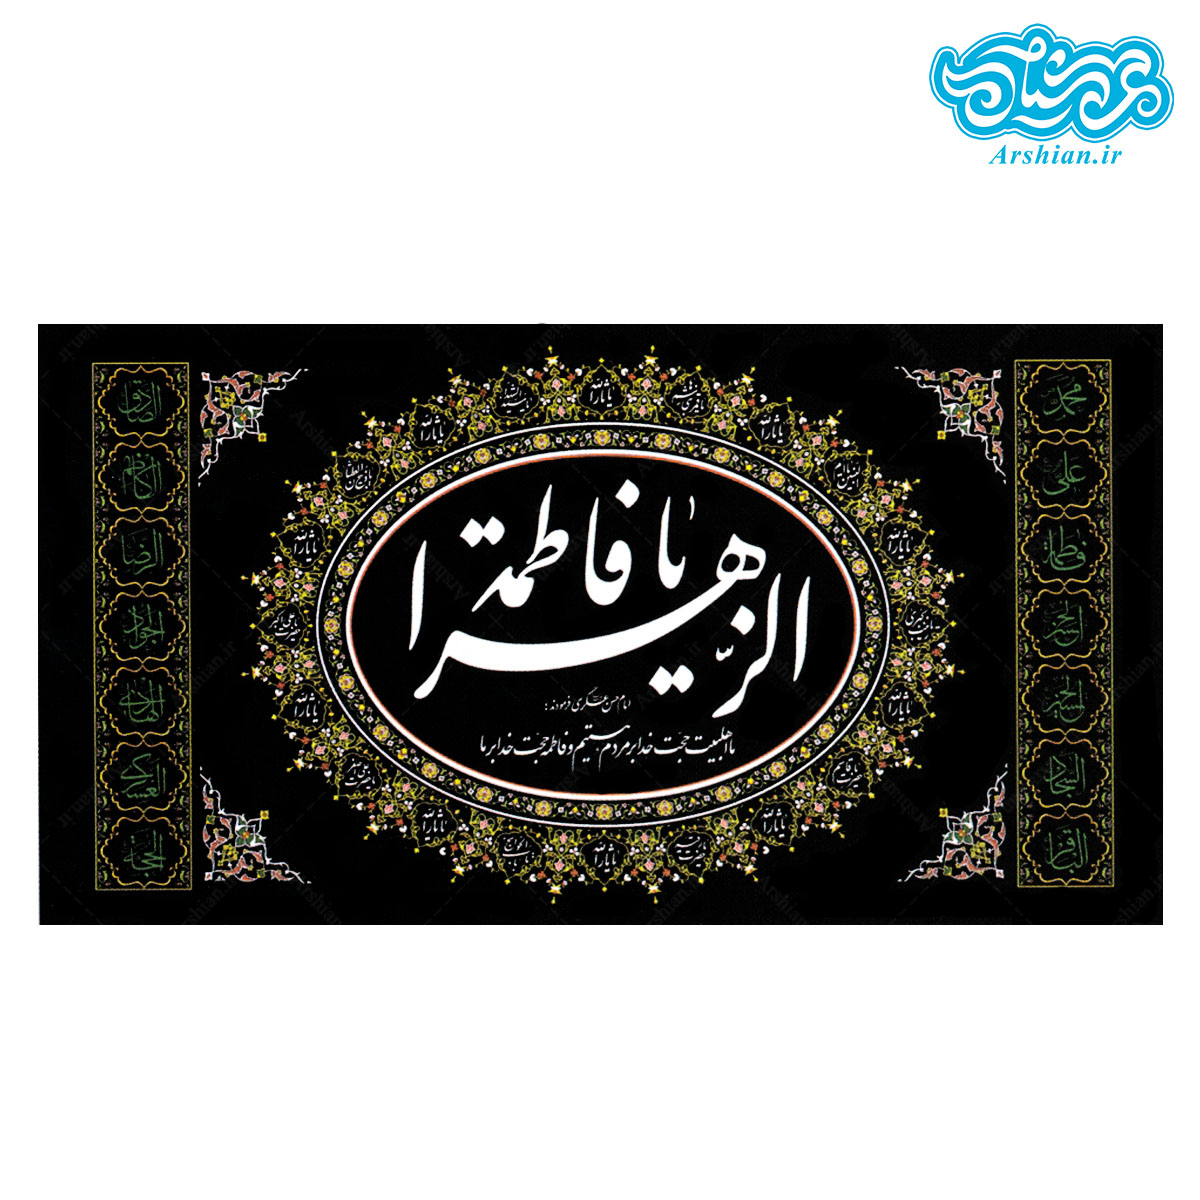 پرچم مخمل یافاطمه الزهرا کد006